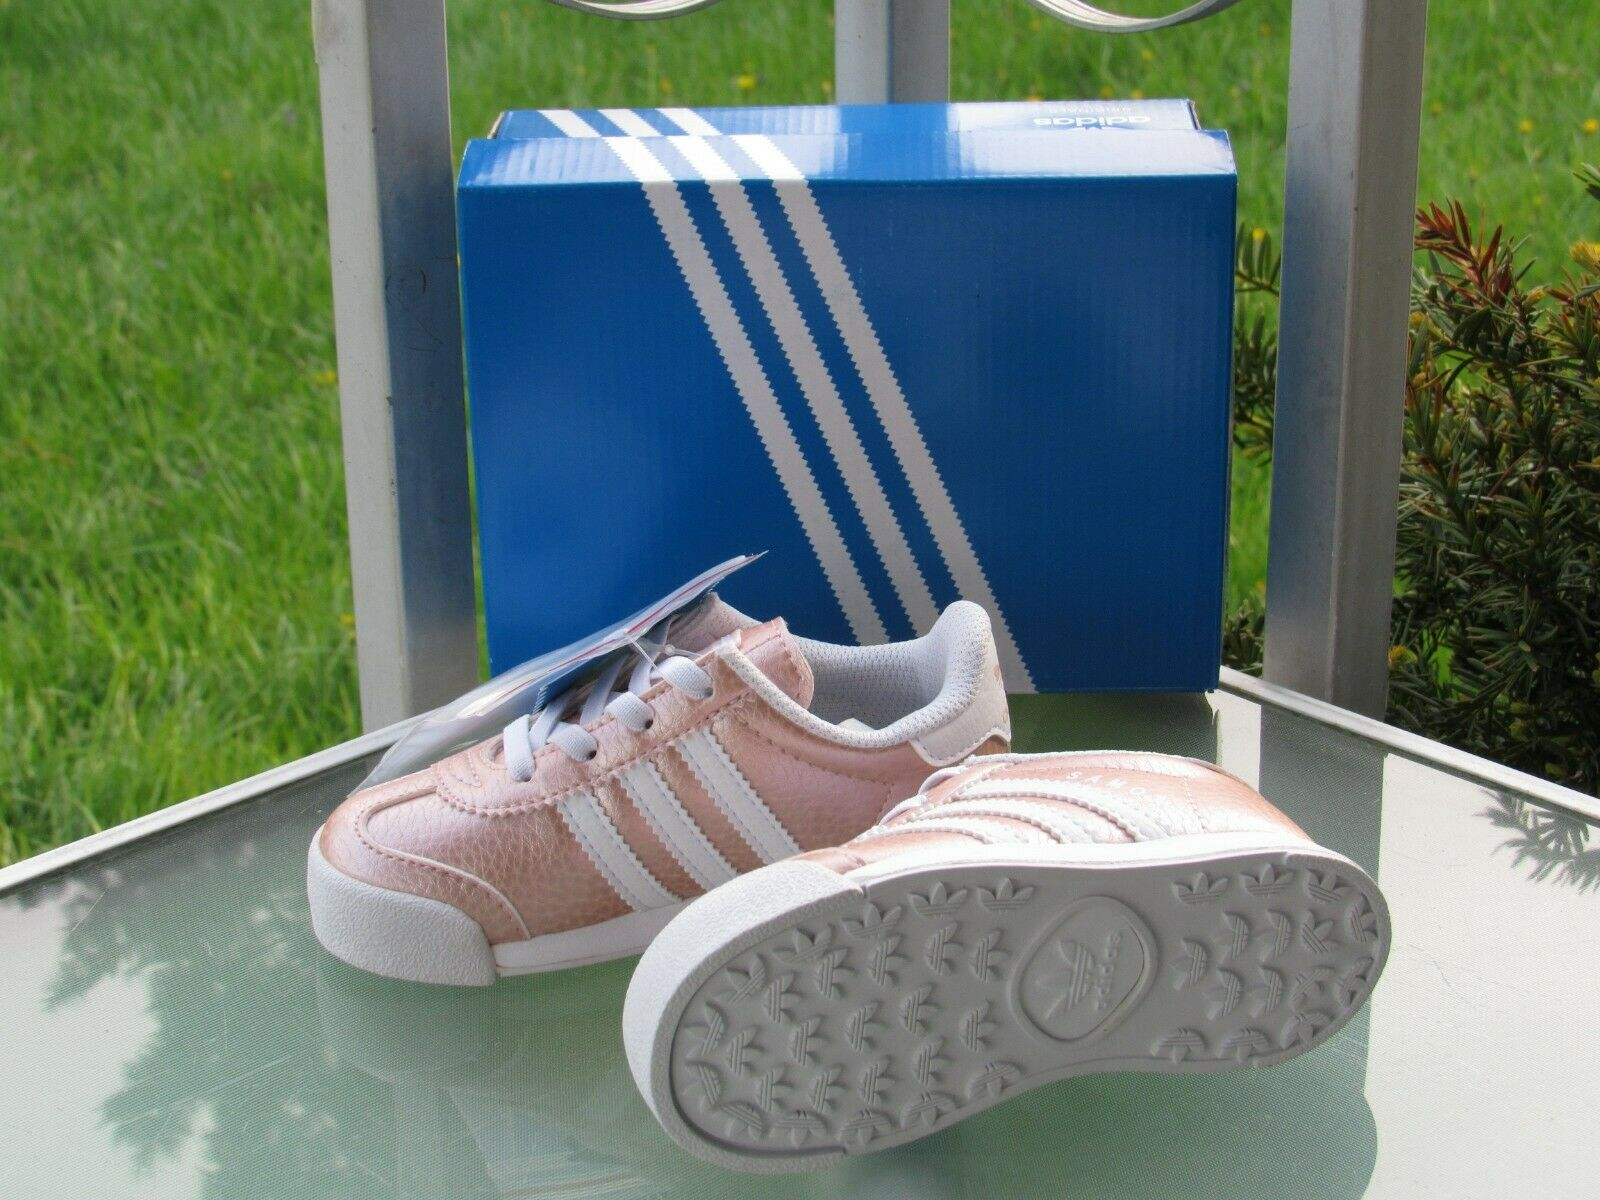 adidas Originals Samoa I Metallic Pink Ortholite Sneakers Little Girls size 7K 1